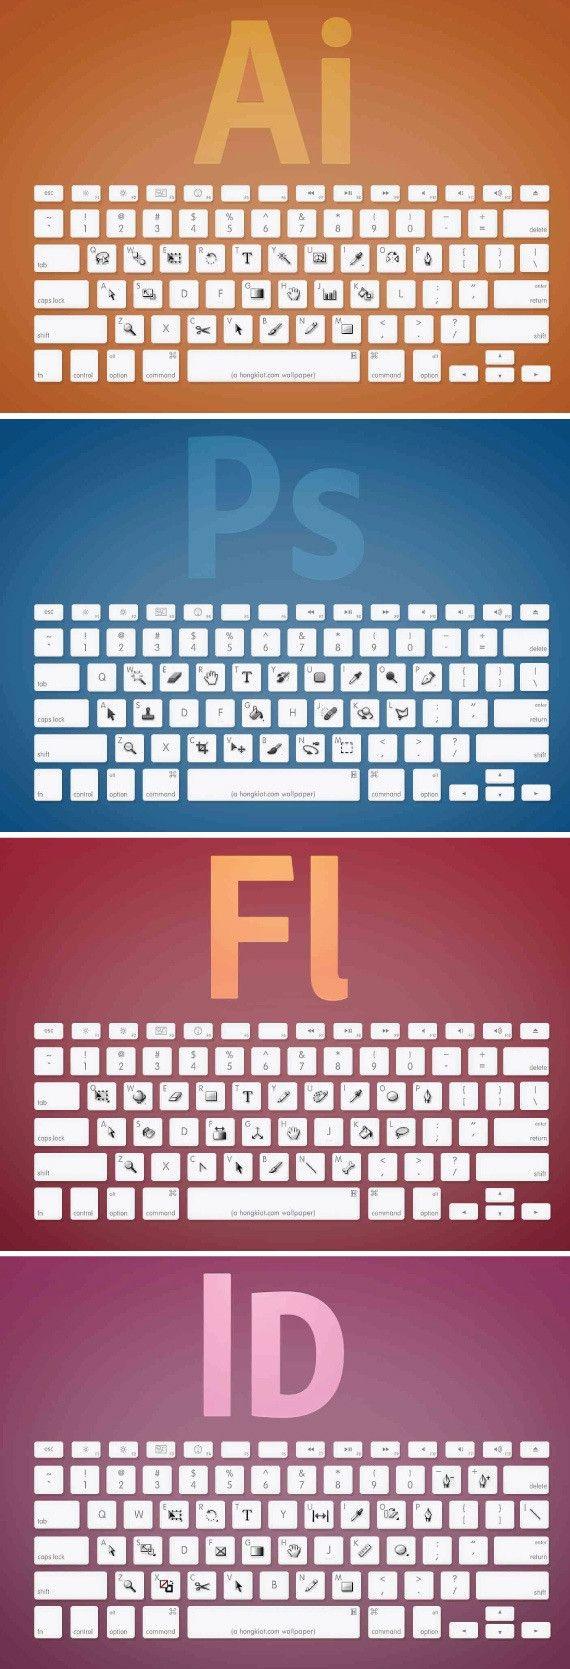 Adobe design suite shortcuts #GraphicDesign #Adobe #CreativeSuite